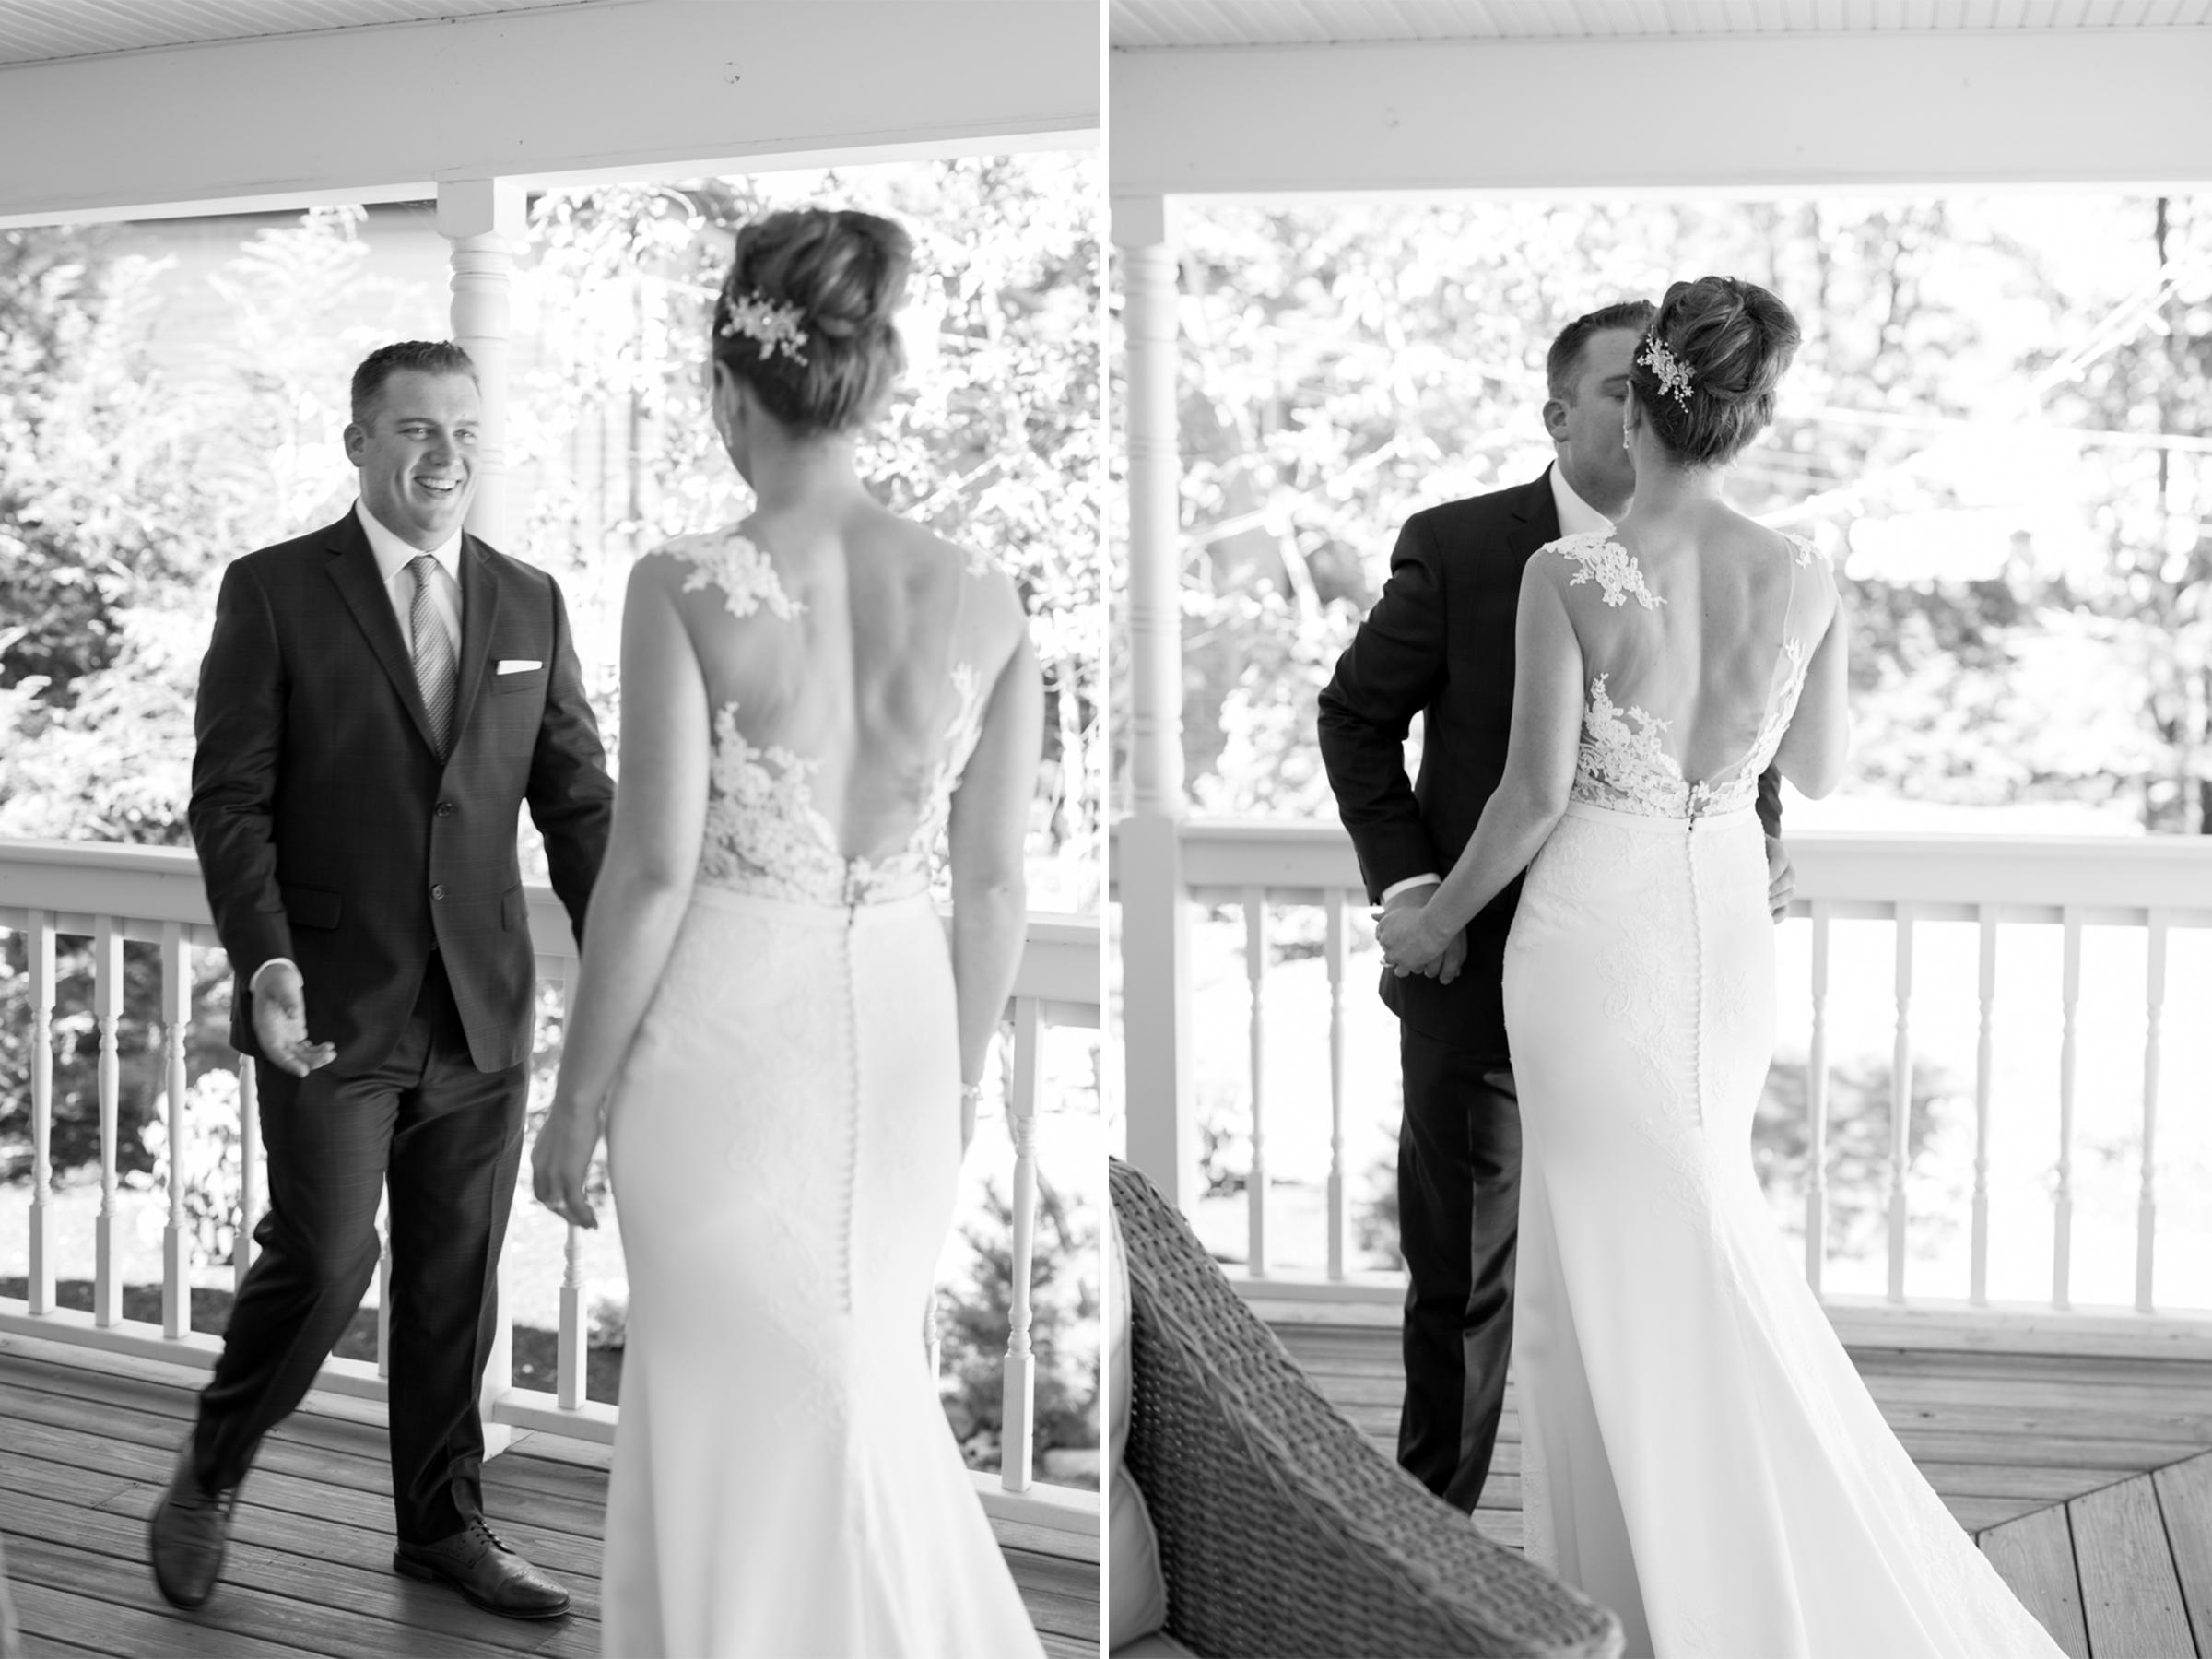 Lauren+AJ- First Look Groom Reaction- DIY Backyard Wedding- New Jersey- Olivia Christina Photo.jpg